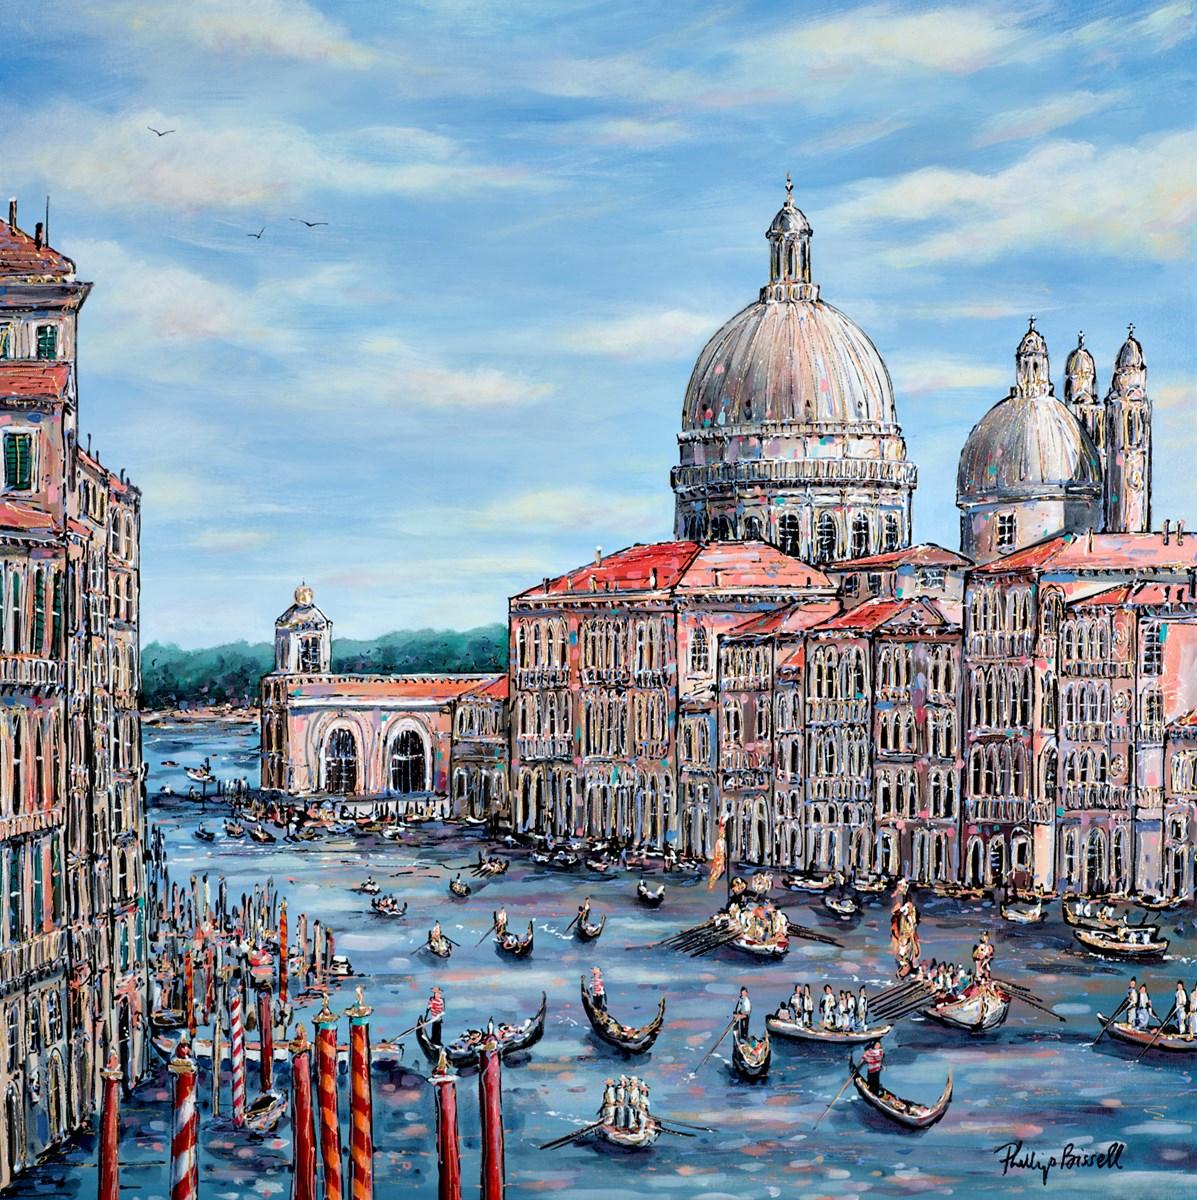 Regatta Storica, Venezia